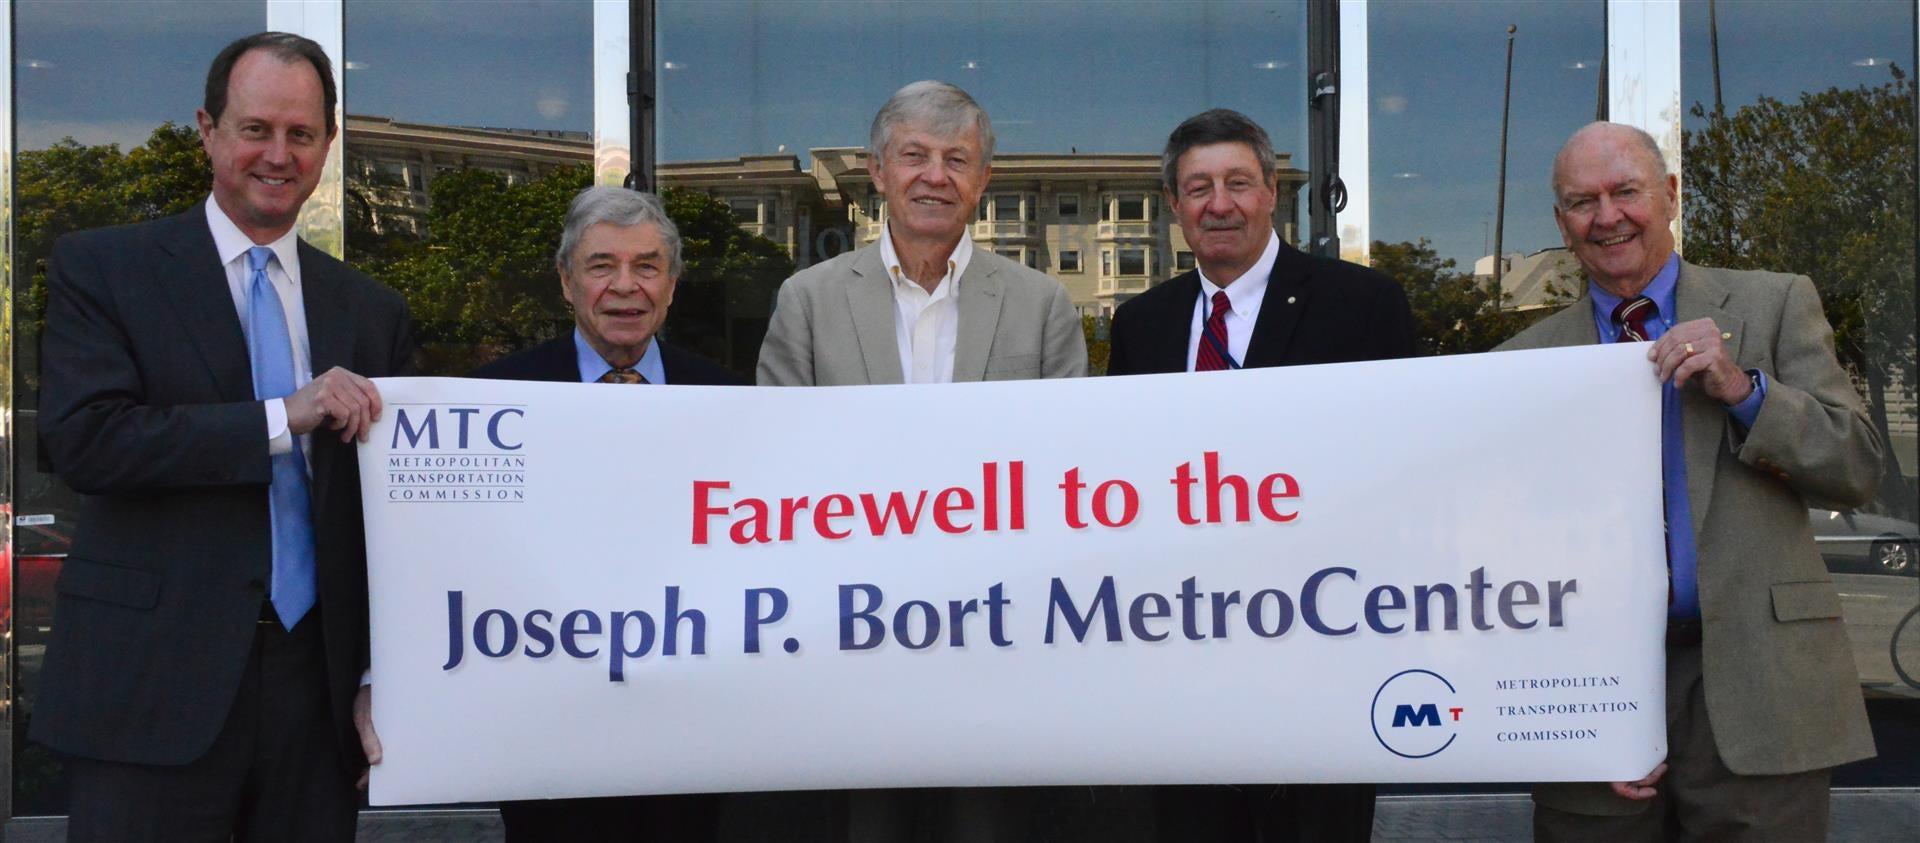 Farewell to the Joseph P. Bort MetroCenter